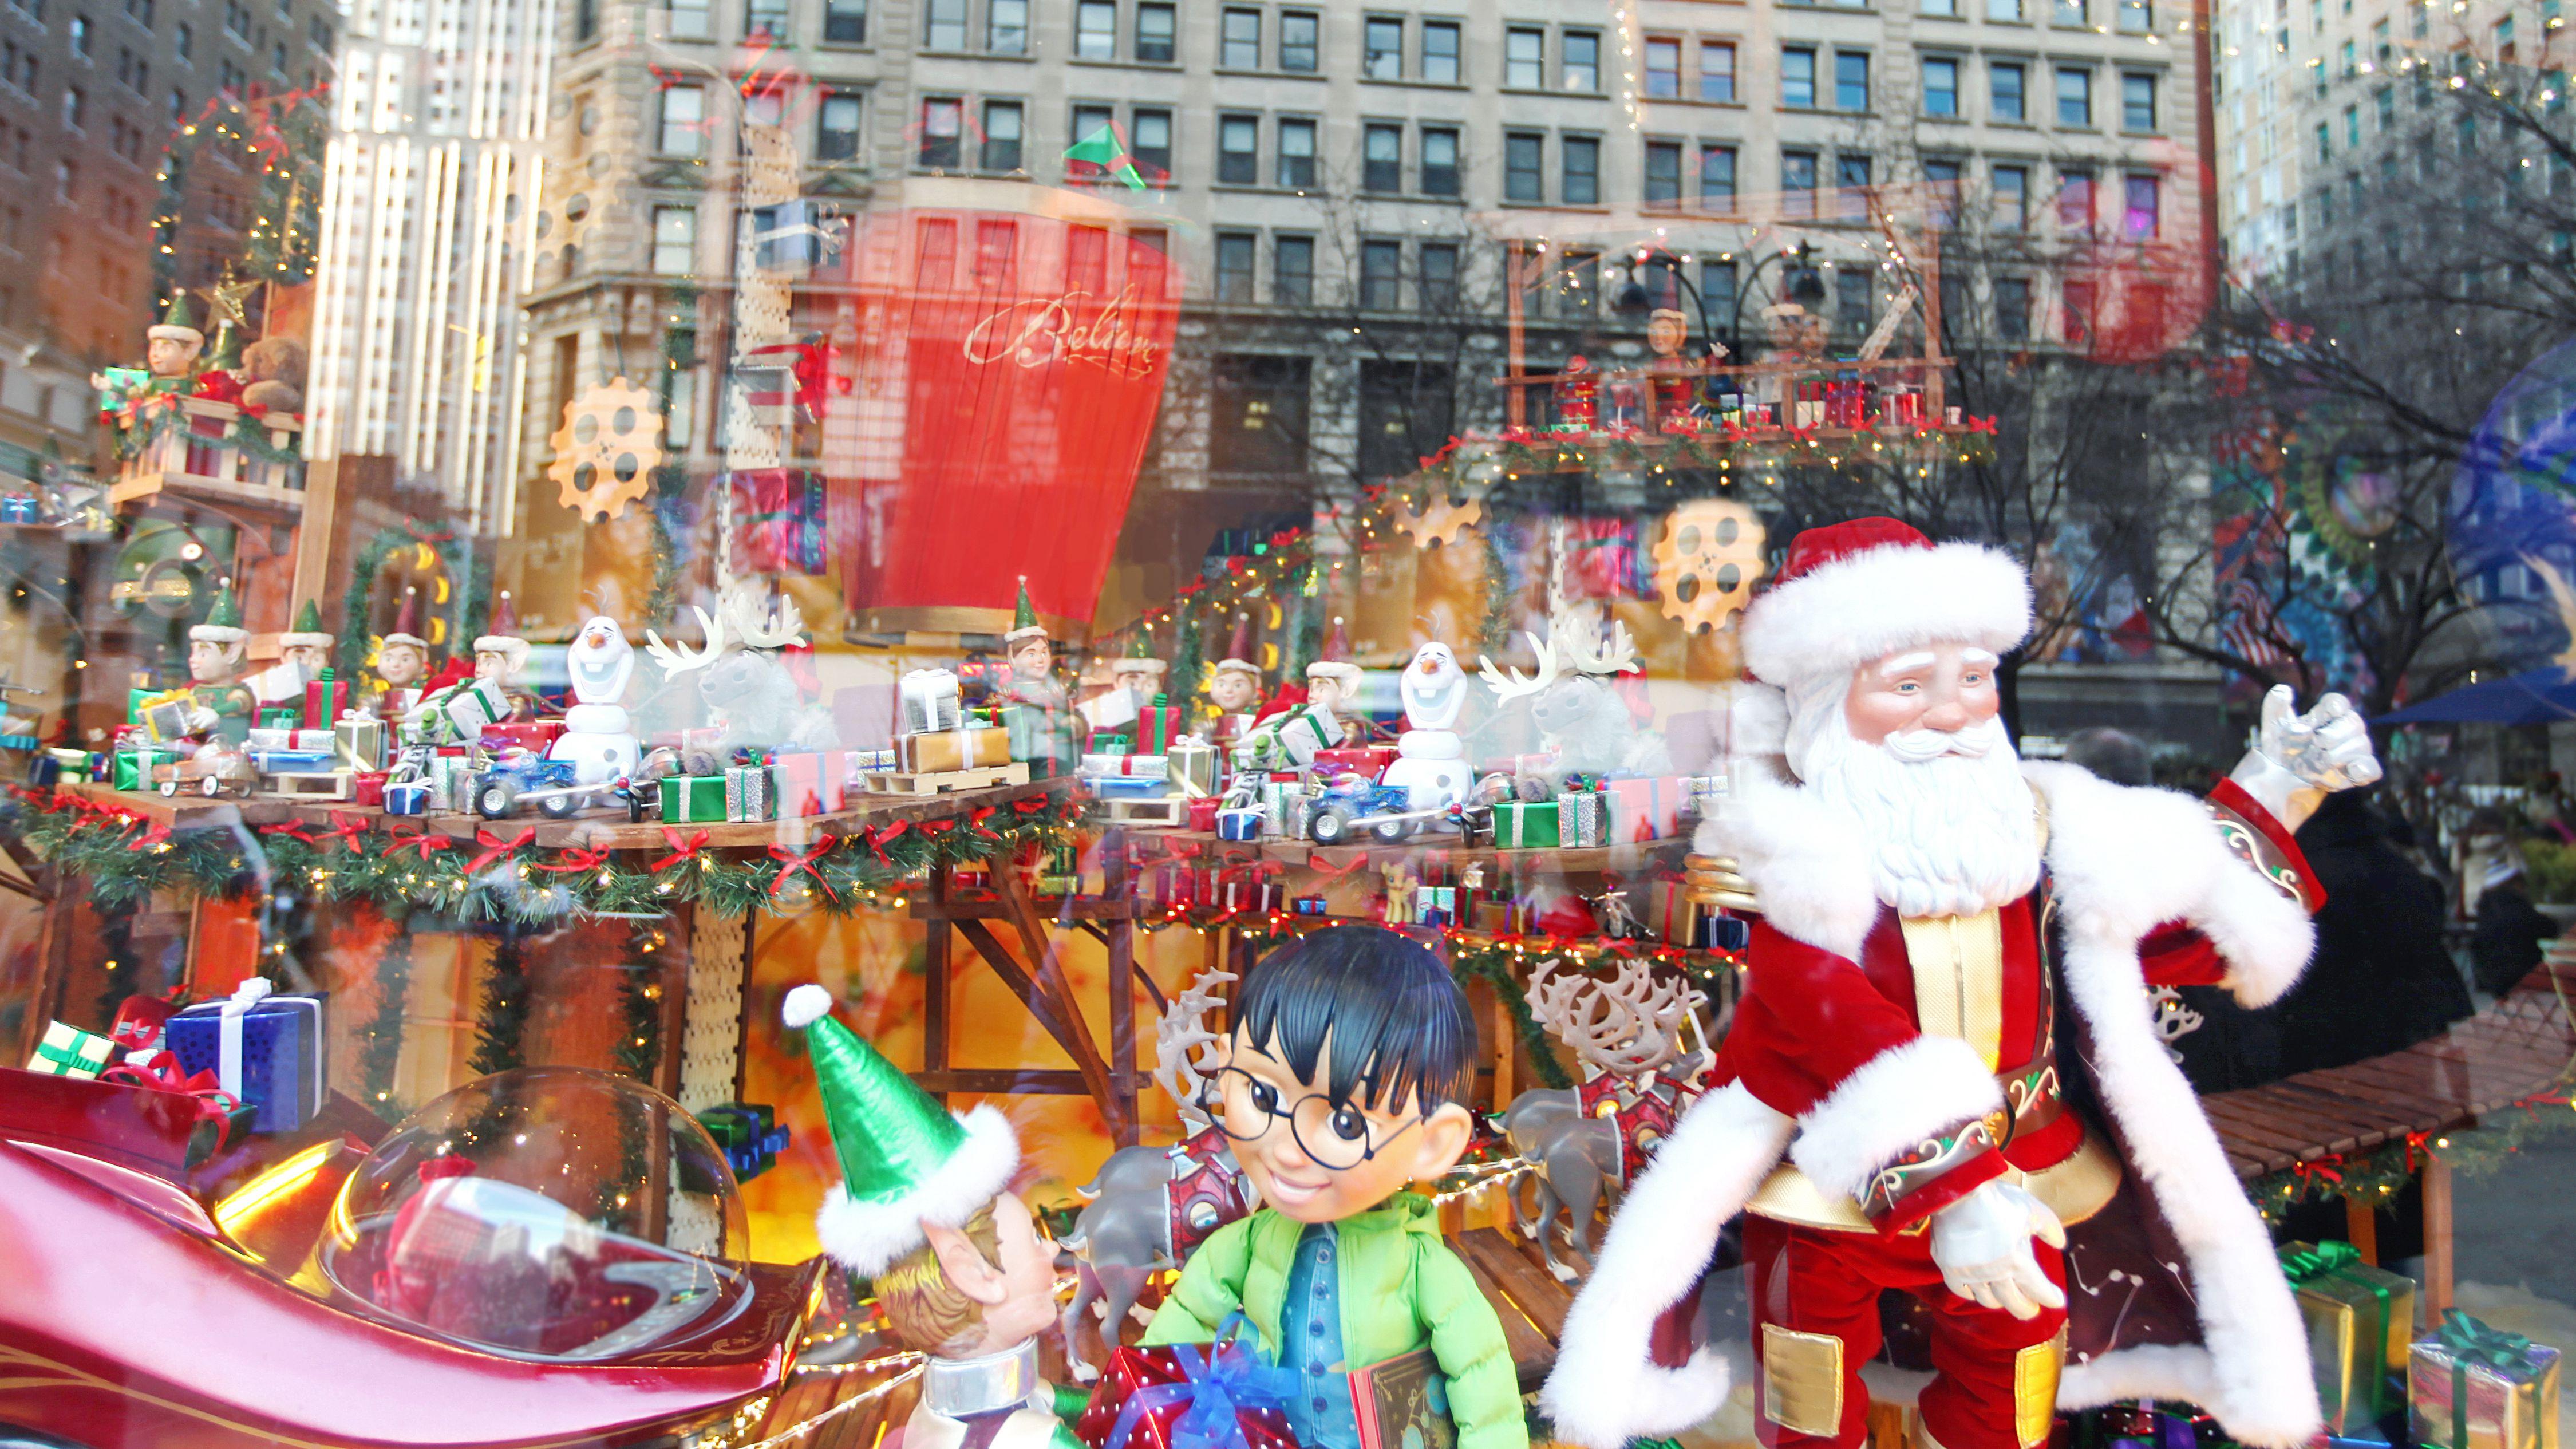 Santa at Macy's Santaland in New York City